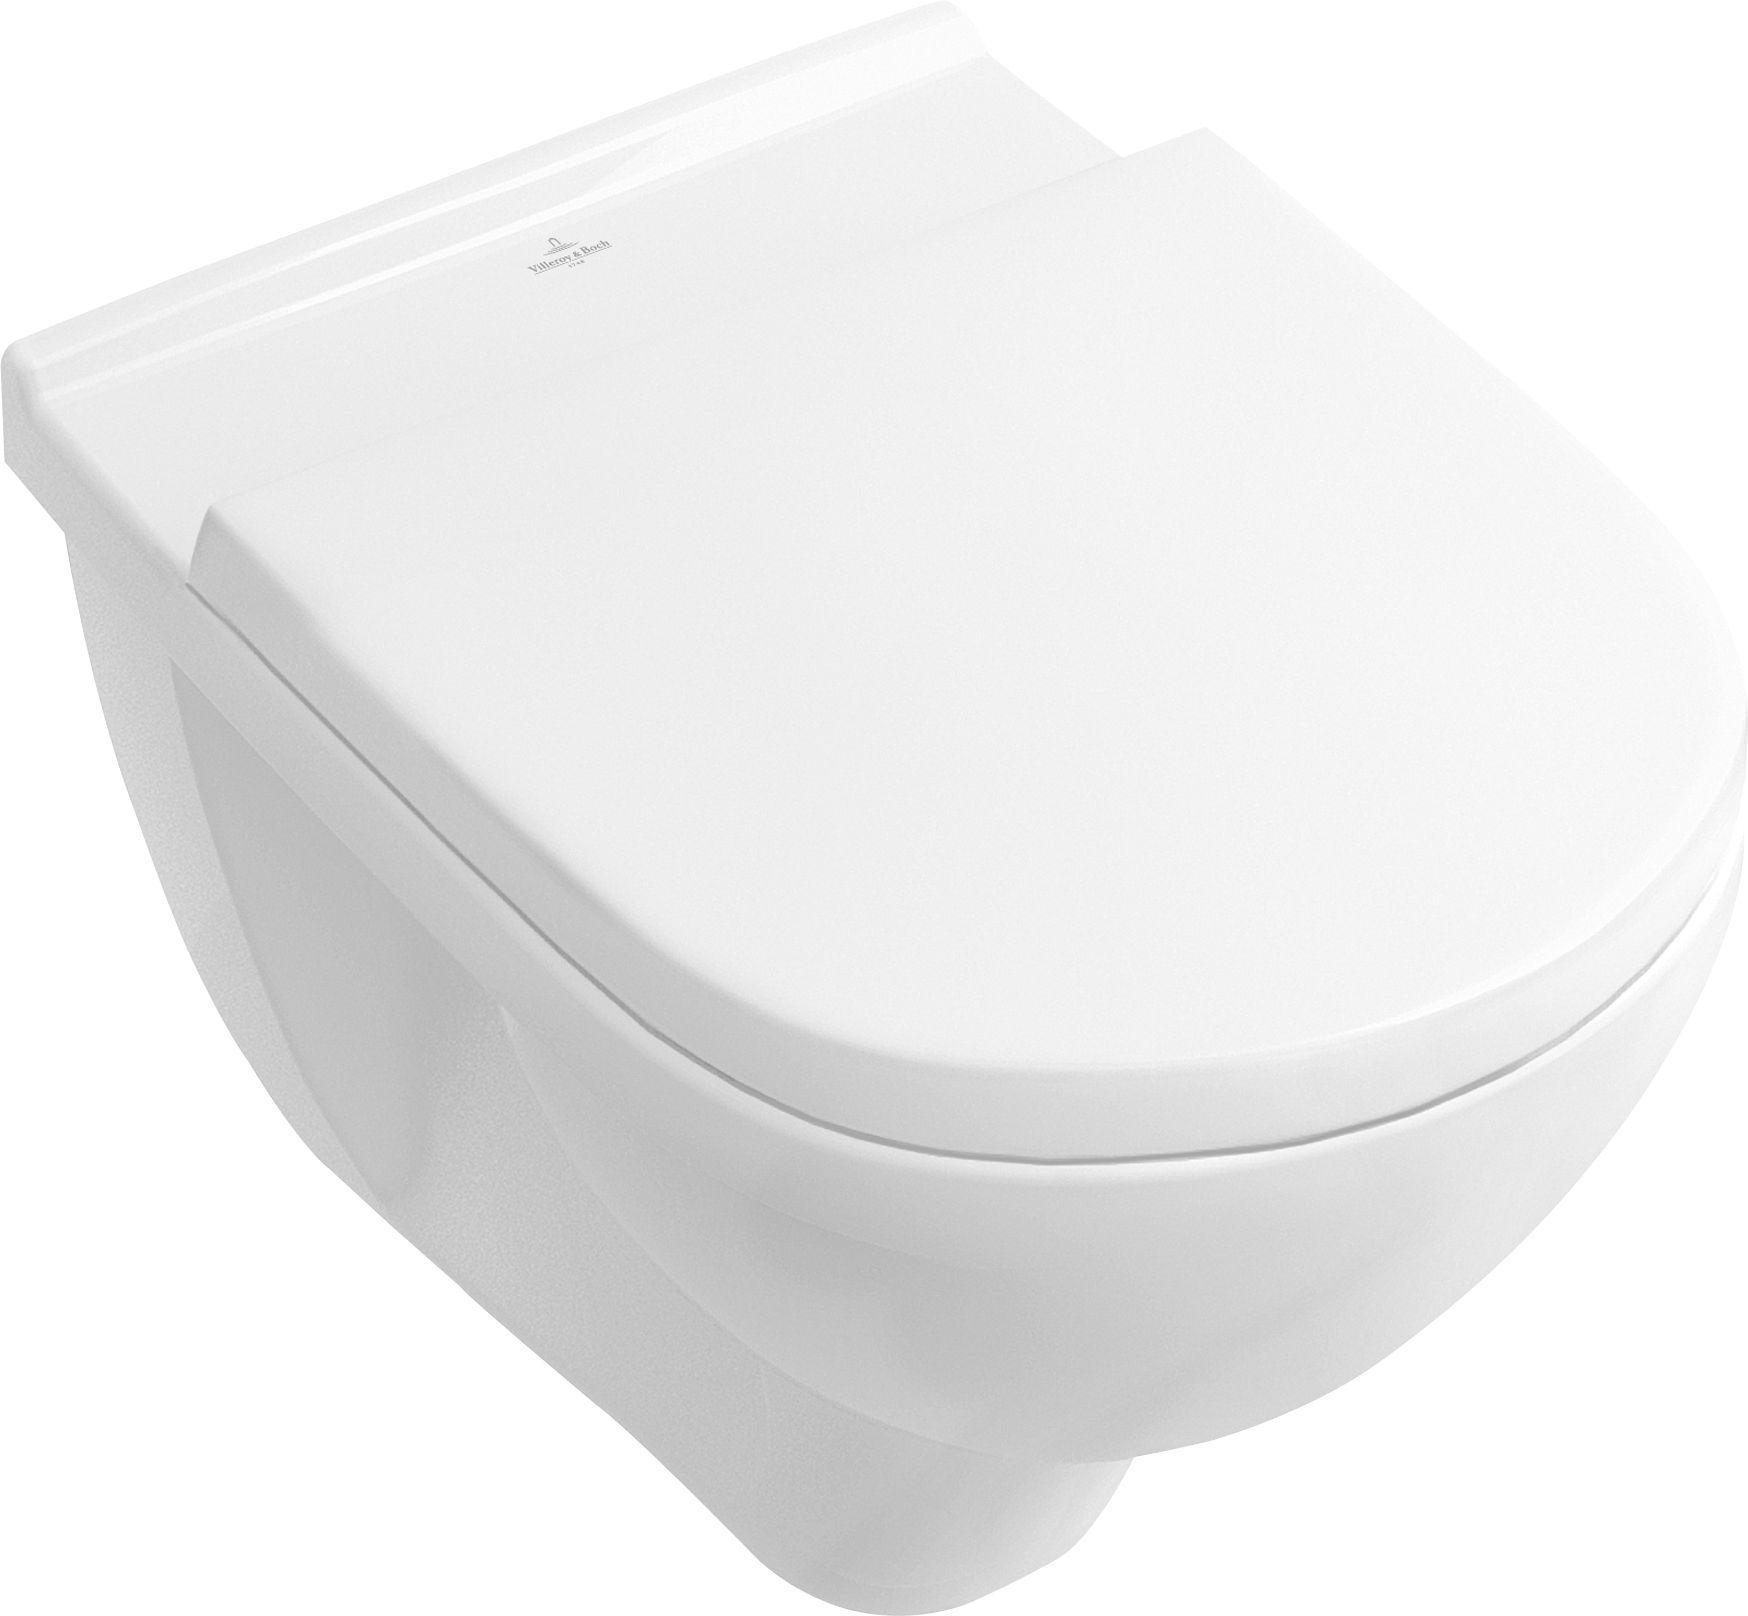 Villeroy & Boch O.novo WC-Sitz 9M396101